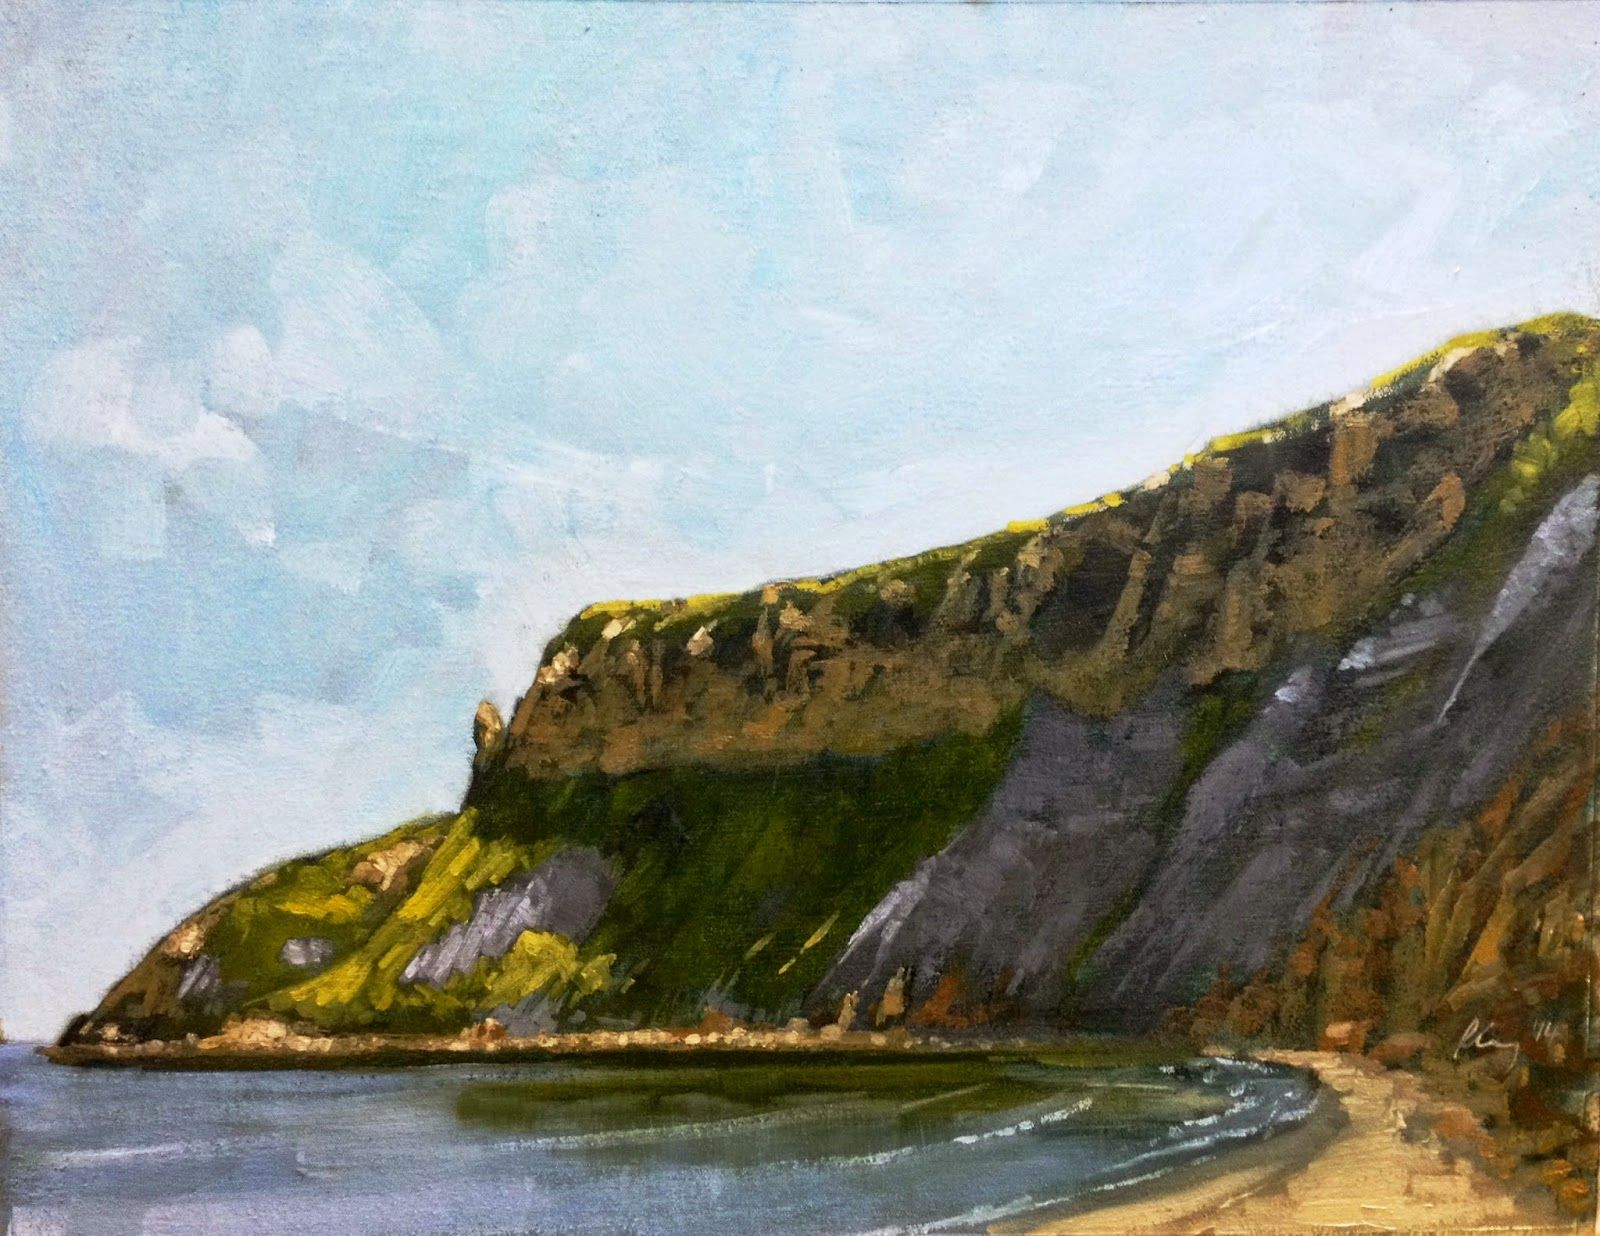 Richard Gray's Paintings: Cayton Bay